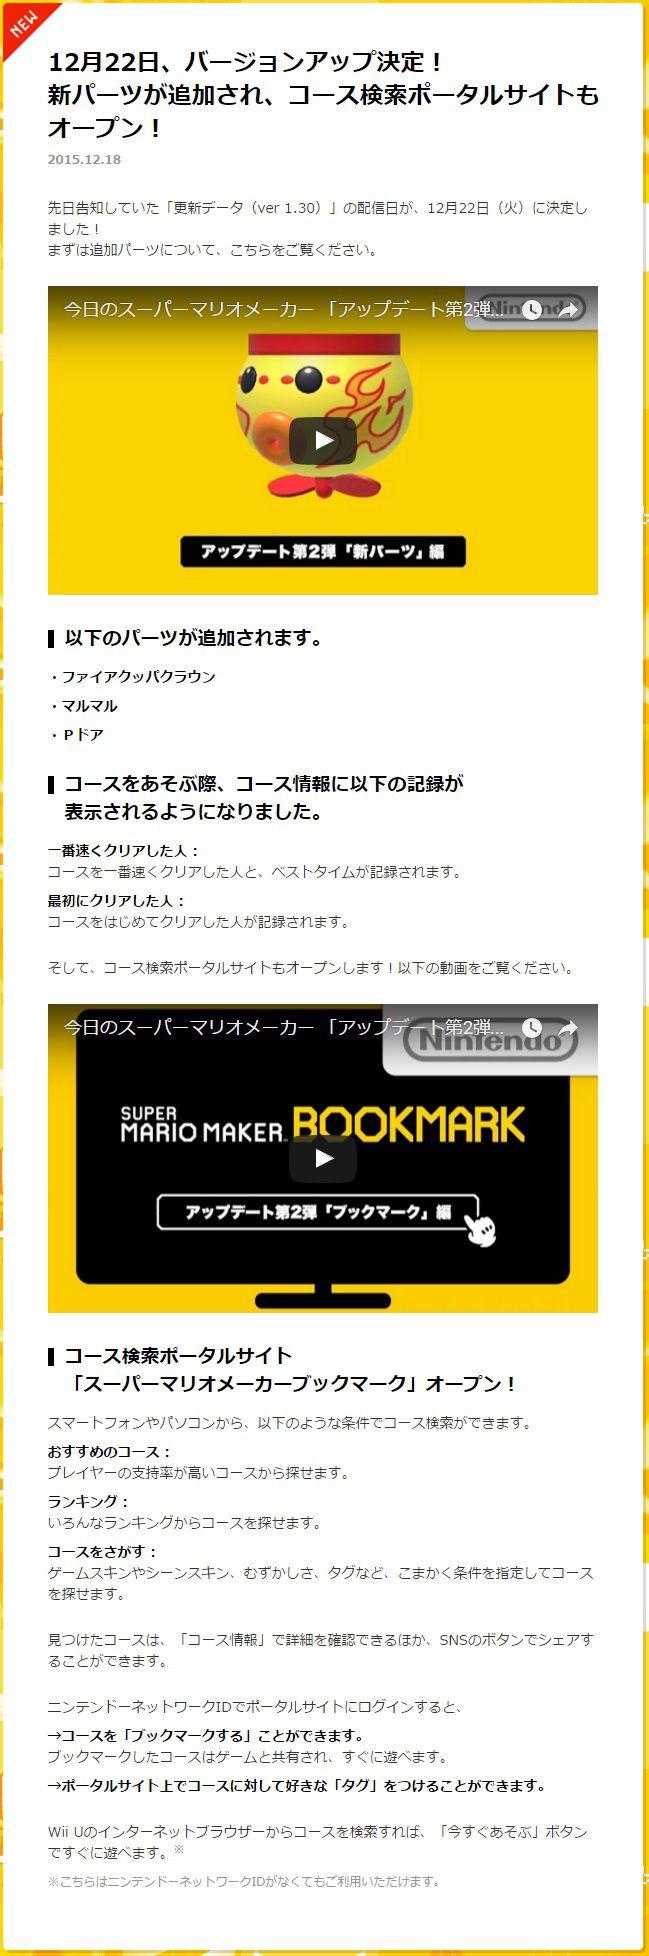 image_3675.jpg